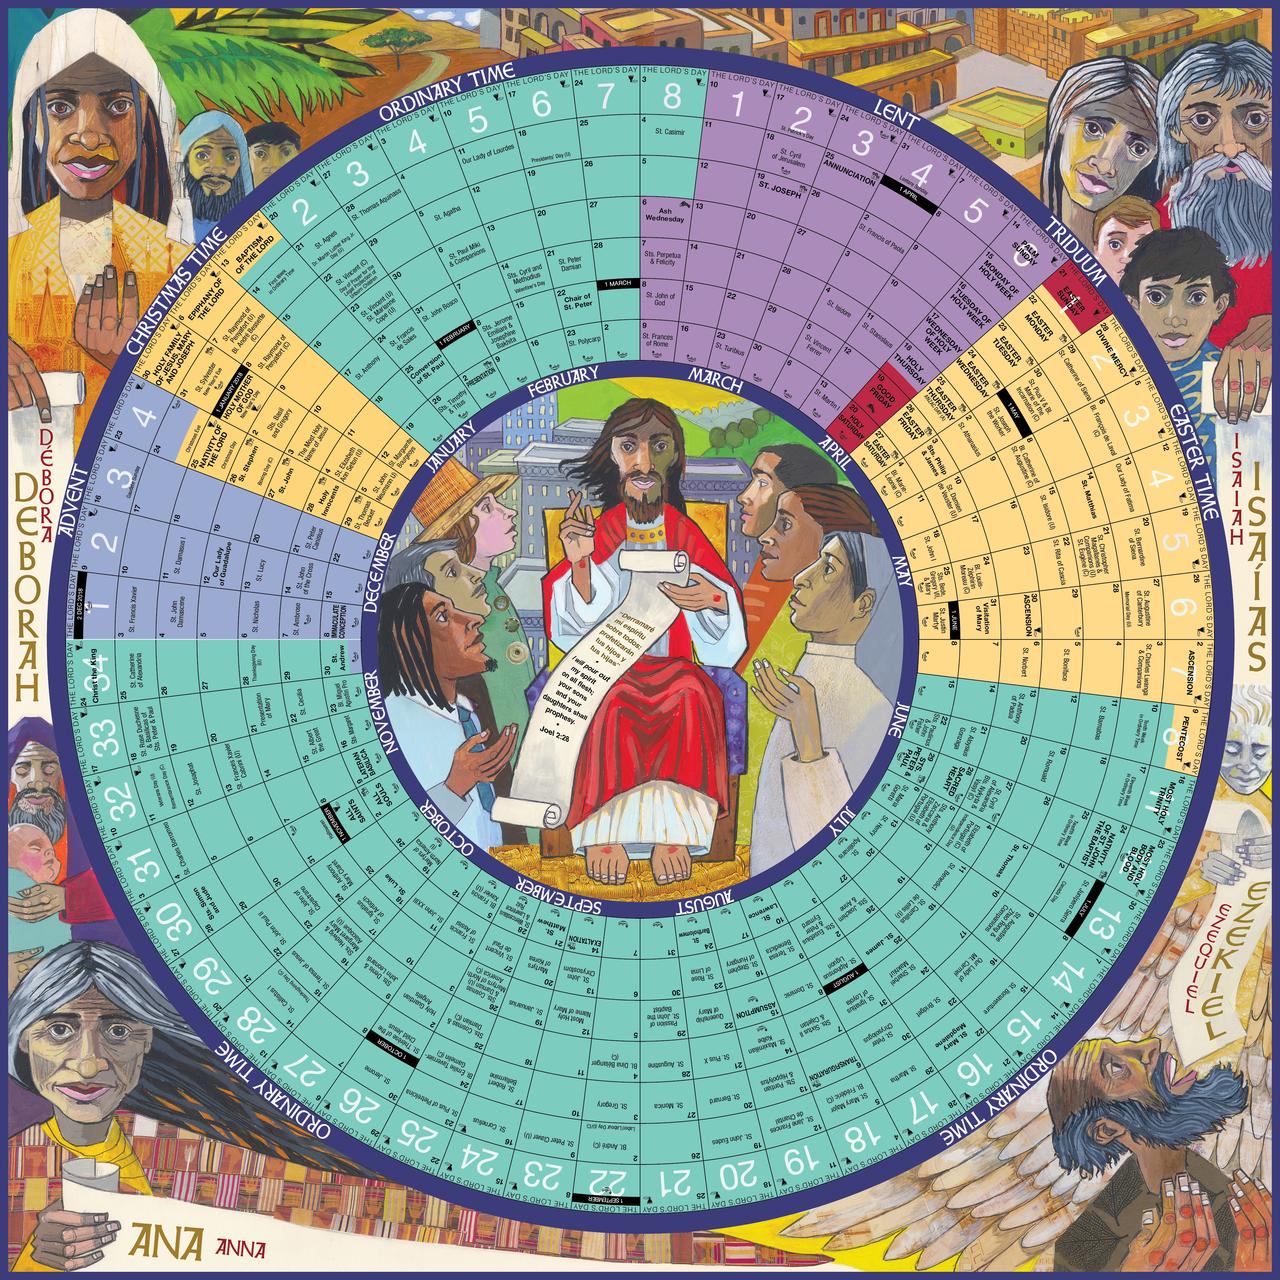 2019 Liturgical Calendar Year of Grace | Calendar | 2019 | 26